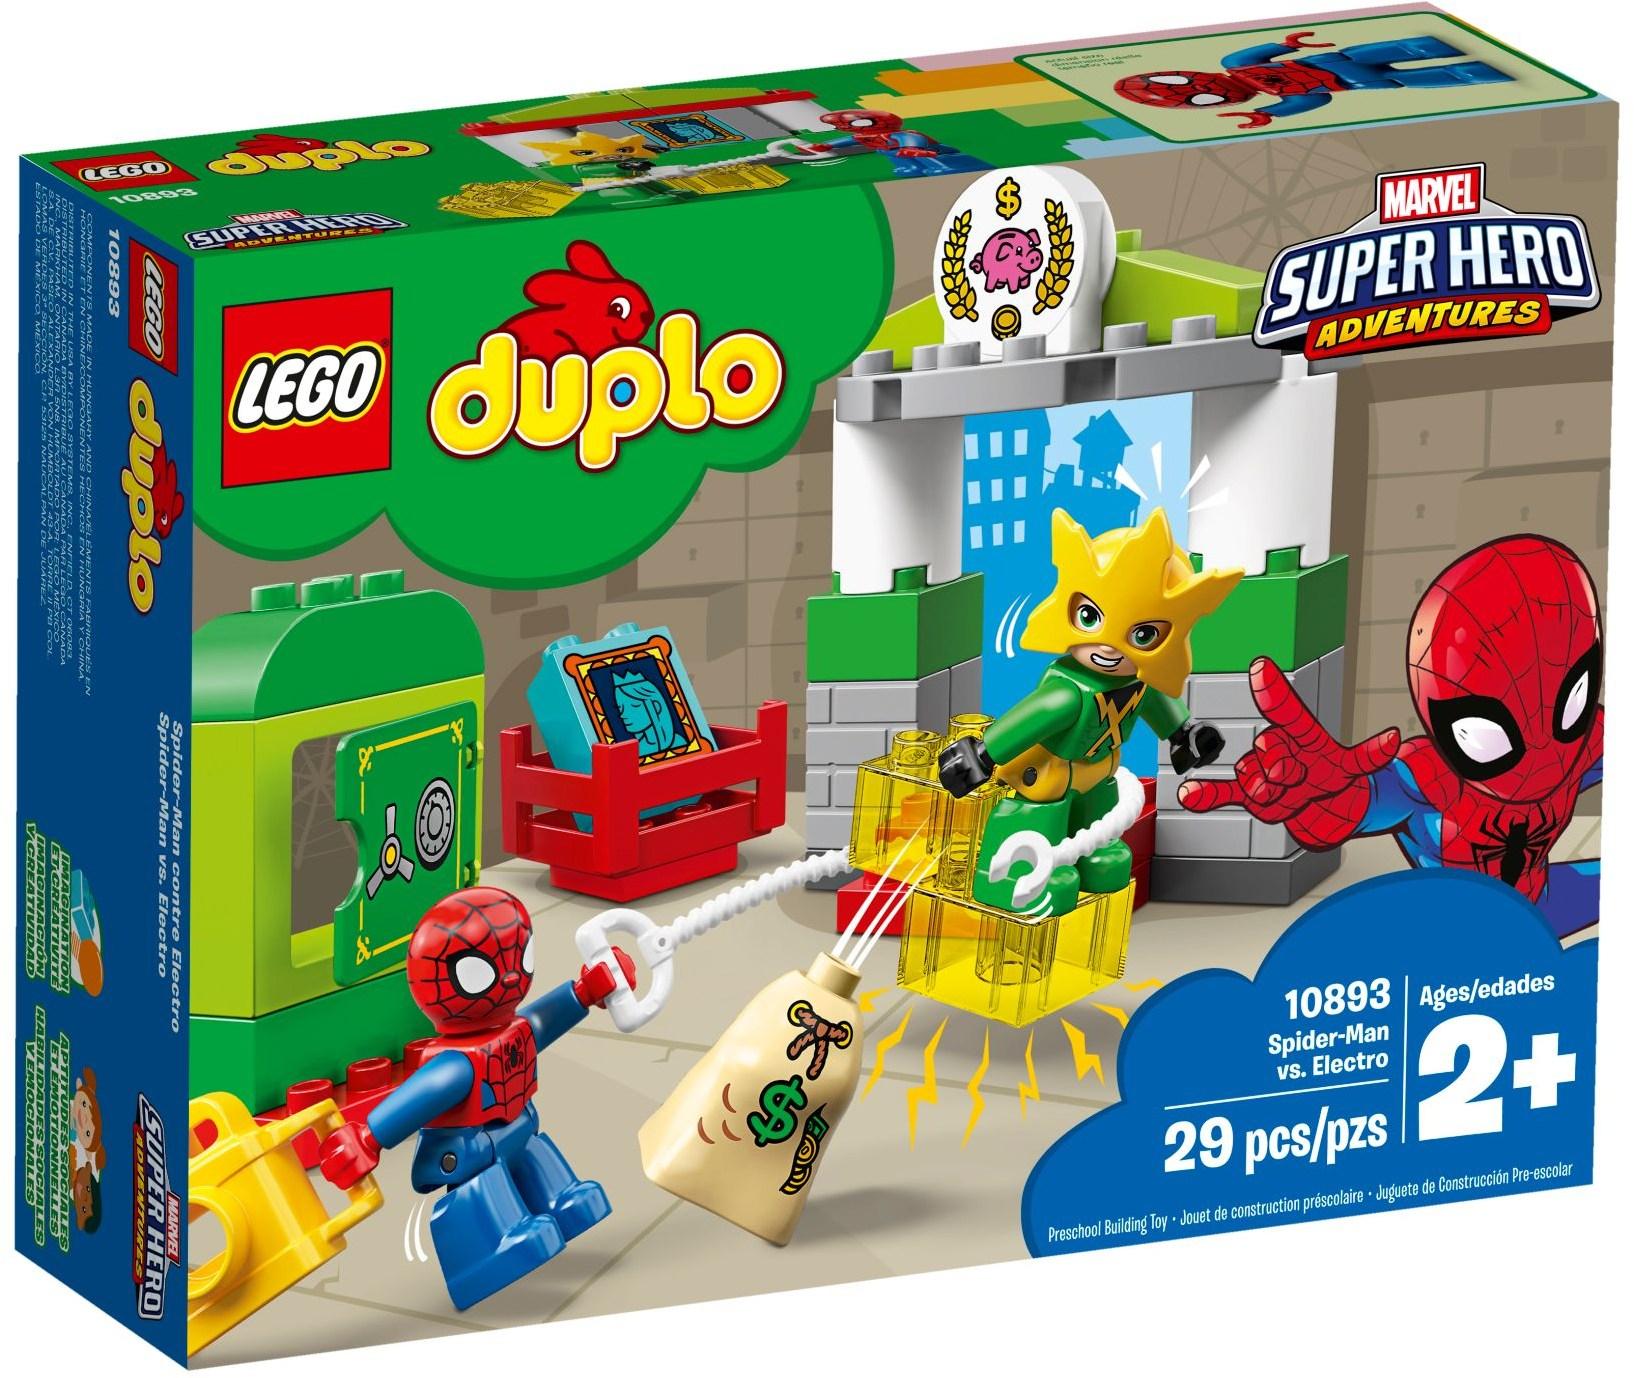 LEGO SPIDERMAN VS. ELECTRO - 10893